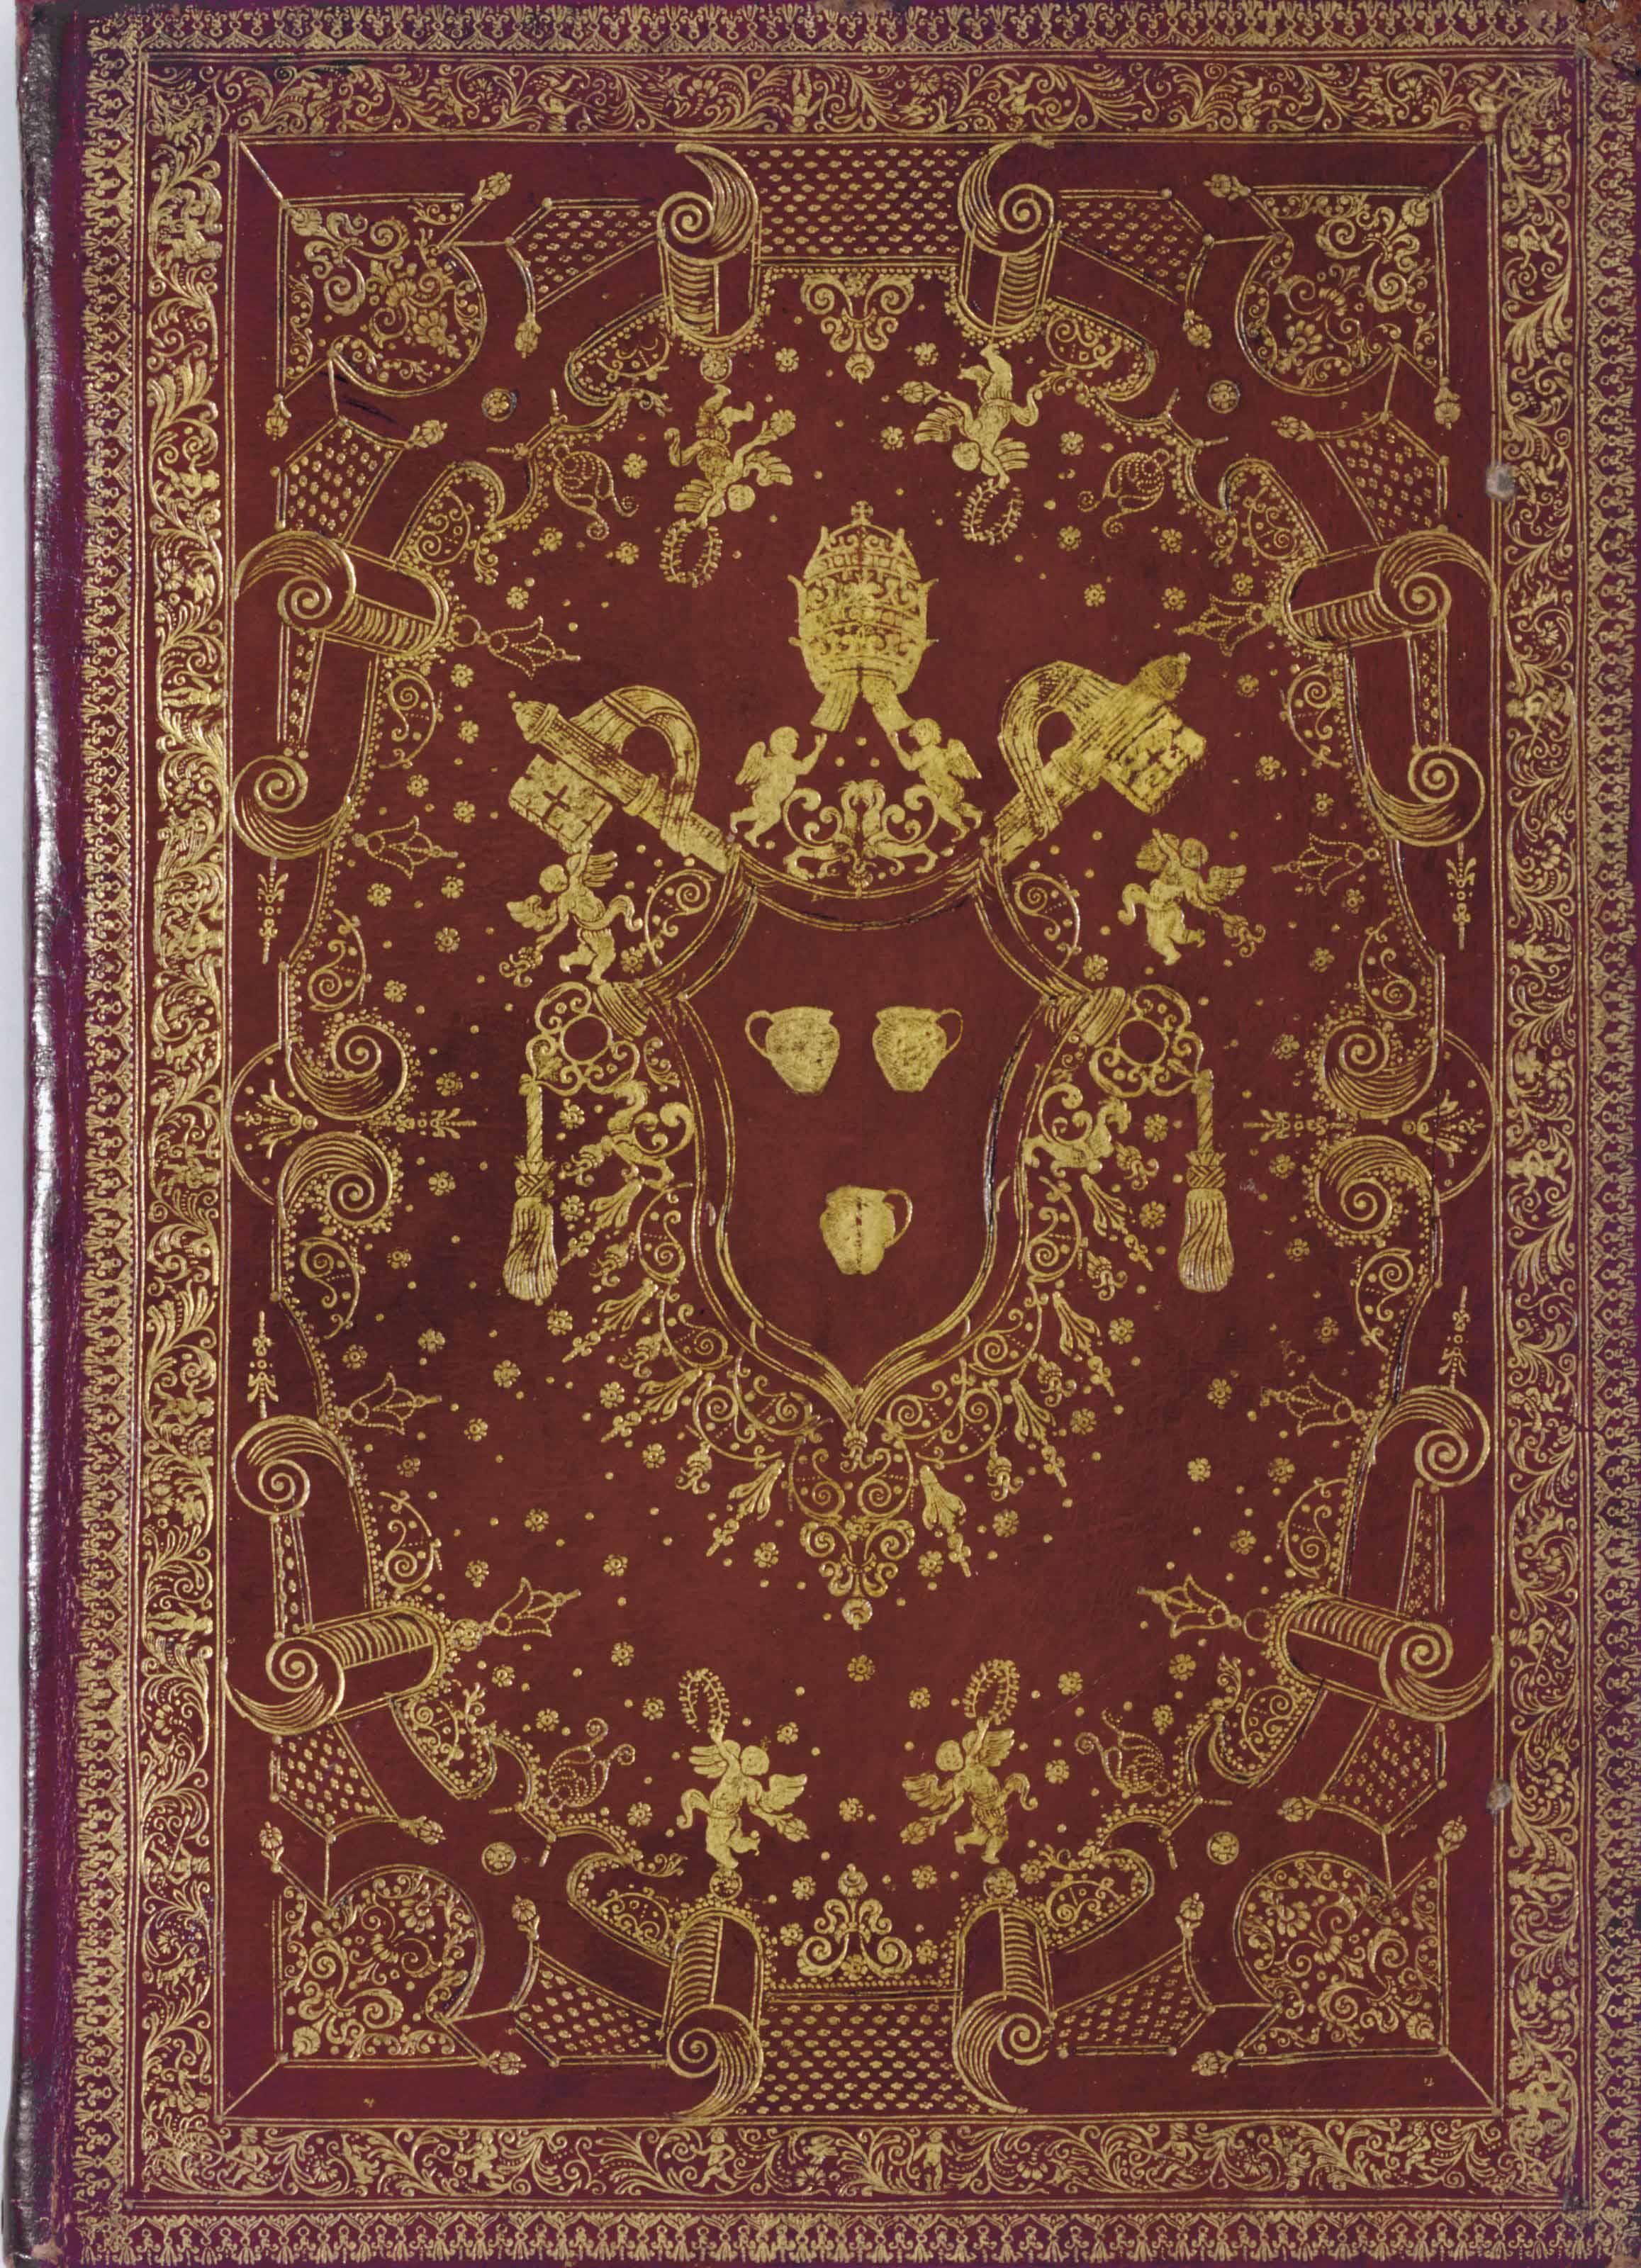 [INNOCENT XII (1615-1700)] --